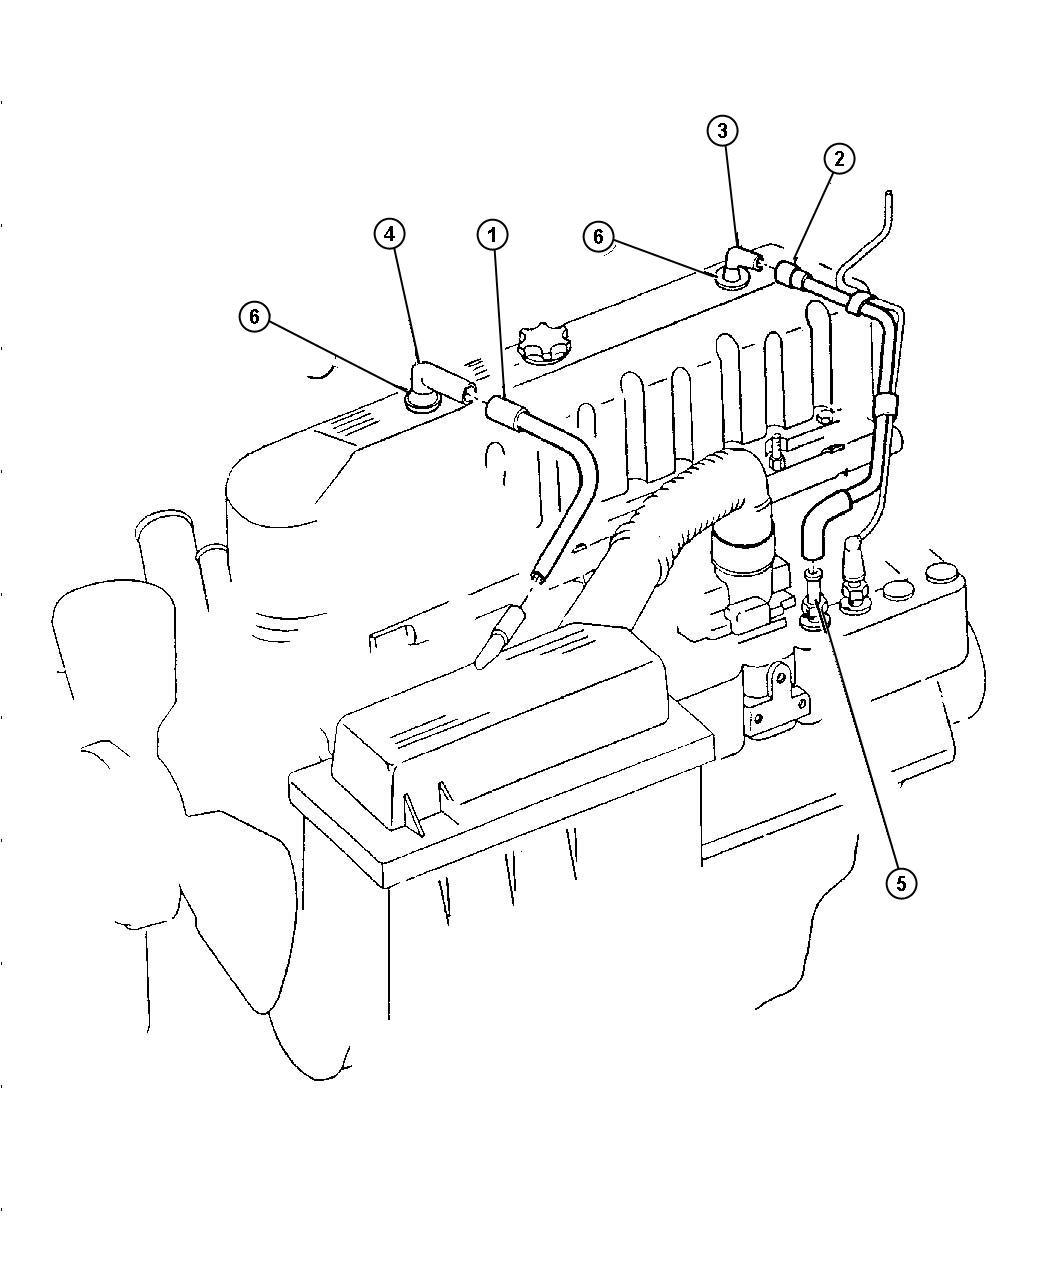 Jeep Wrangler Crankcase Ventilation 4 0 Erh